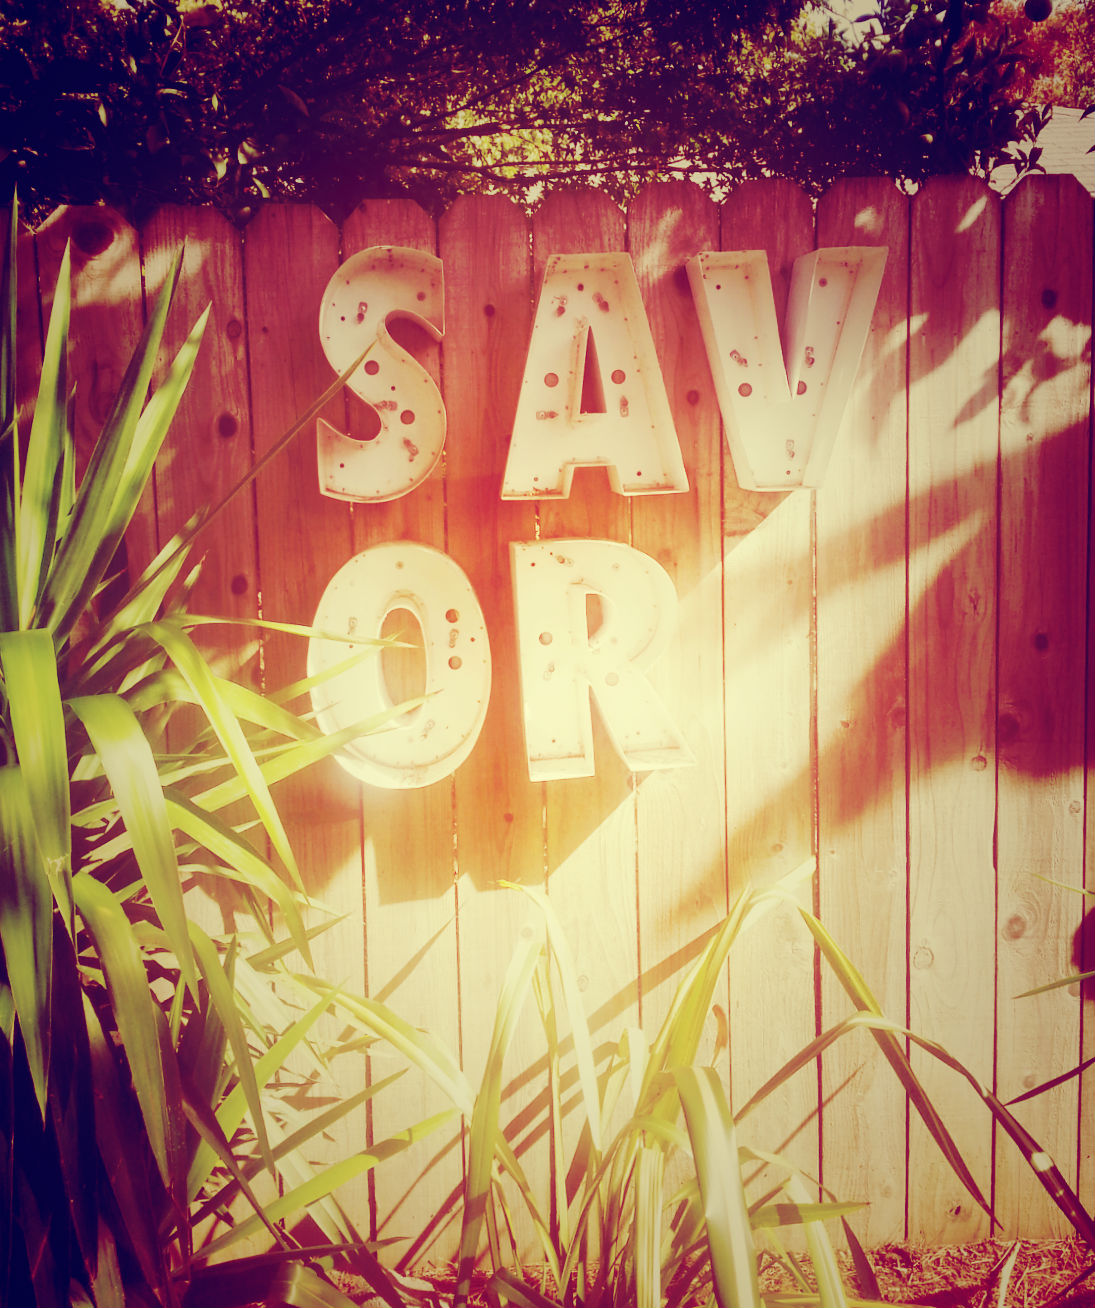 Instructive signage on the patio at Bravas